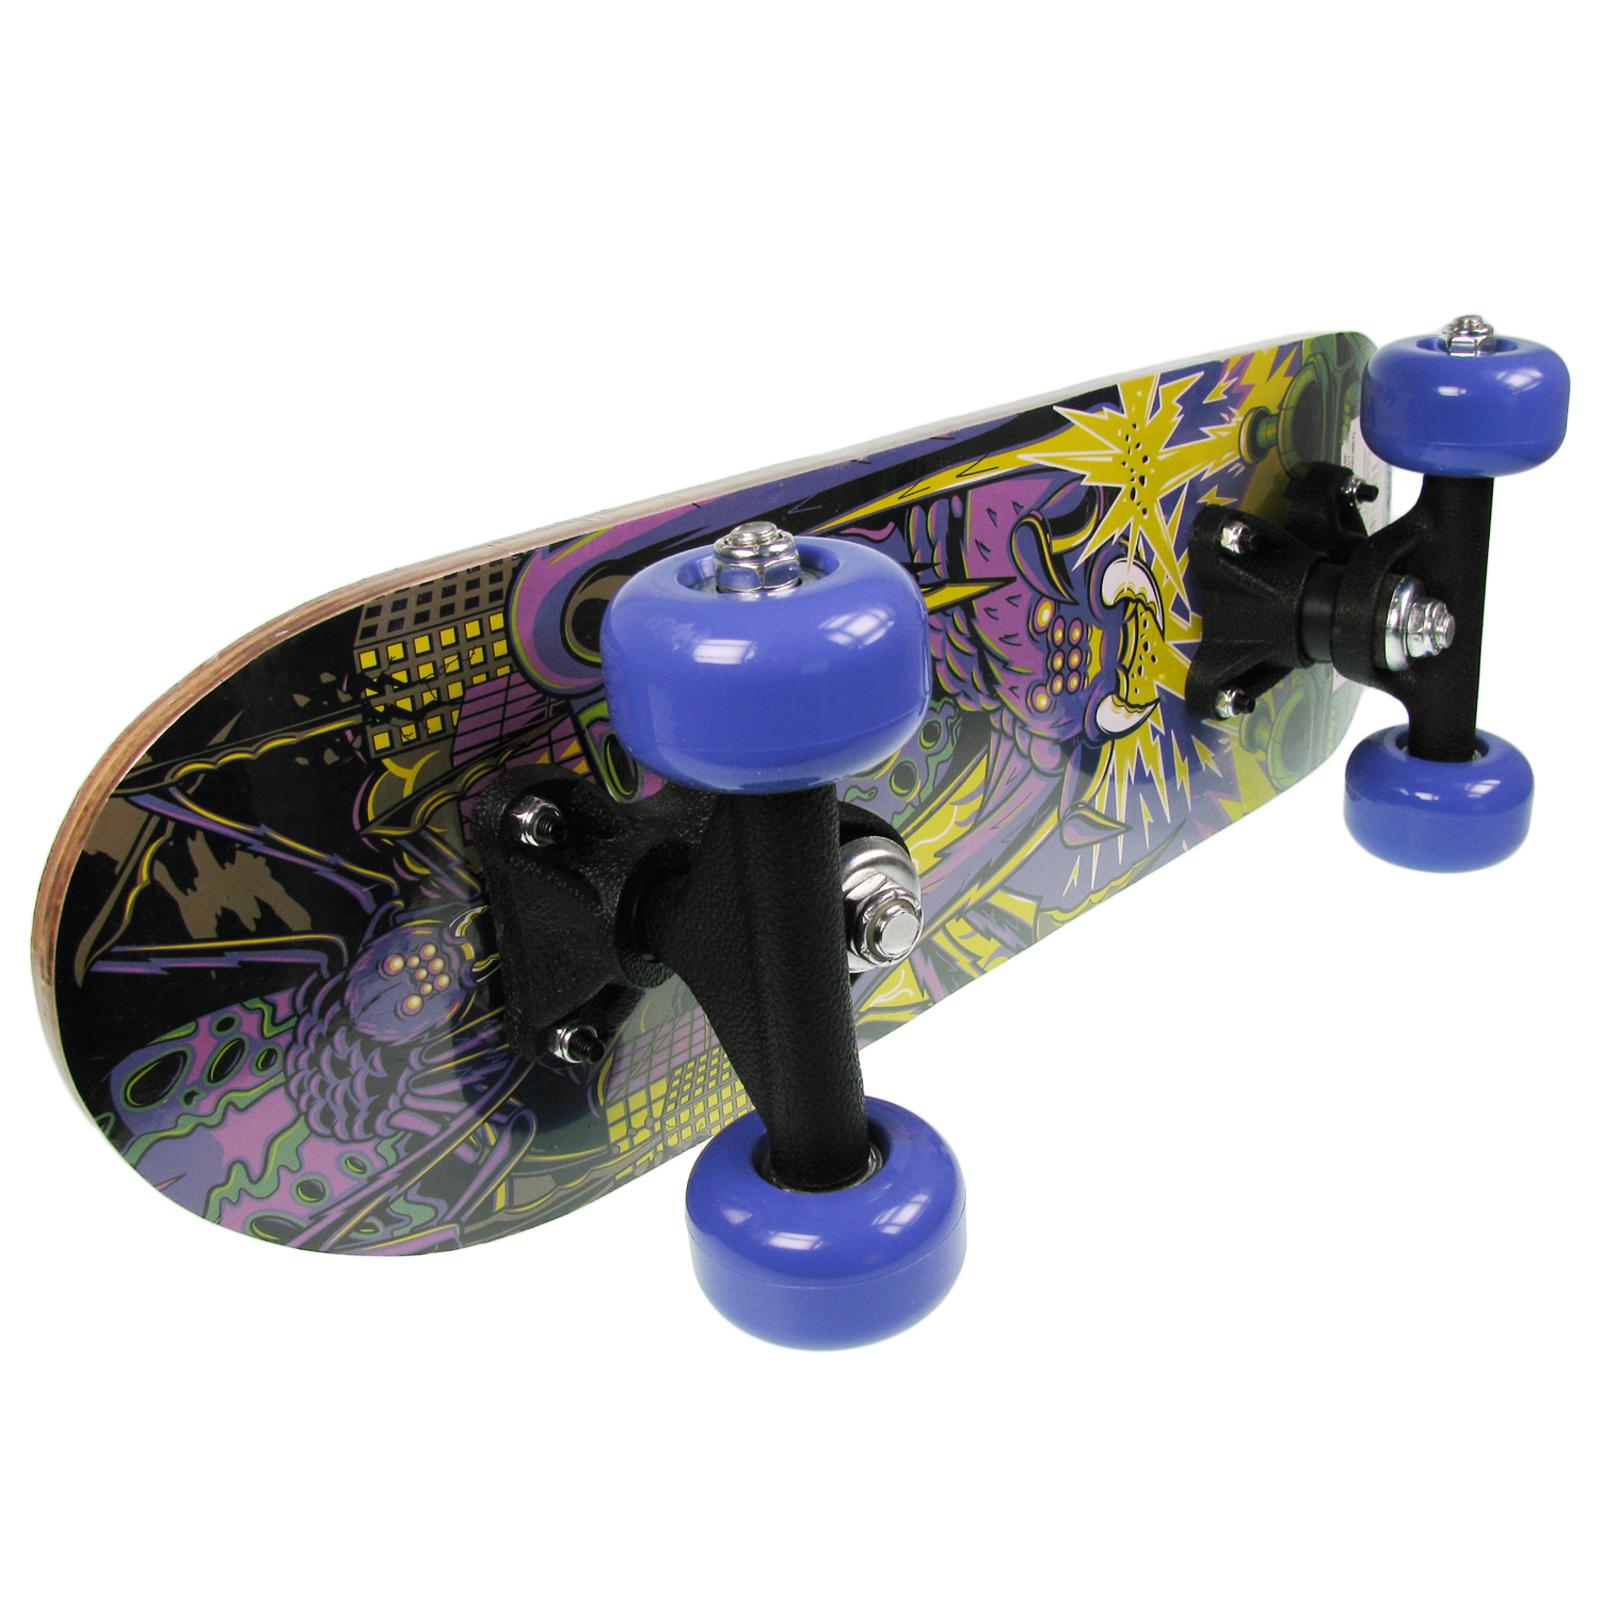 Wilton amp bradley kid childrens beginner osprey purple mini skateboard